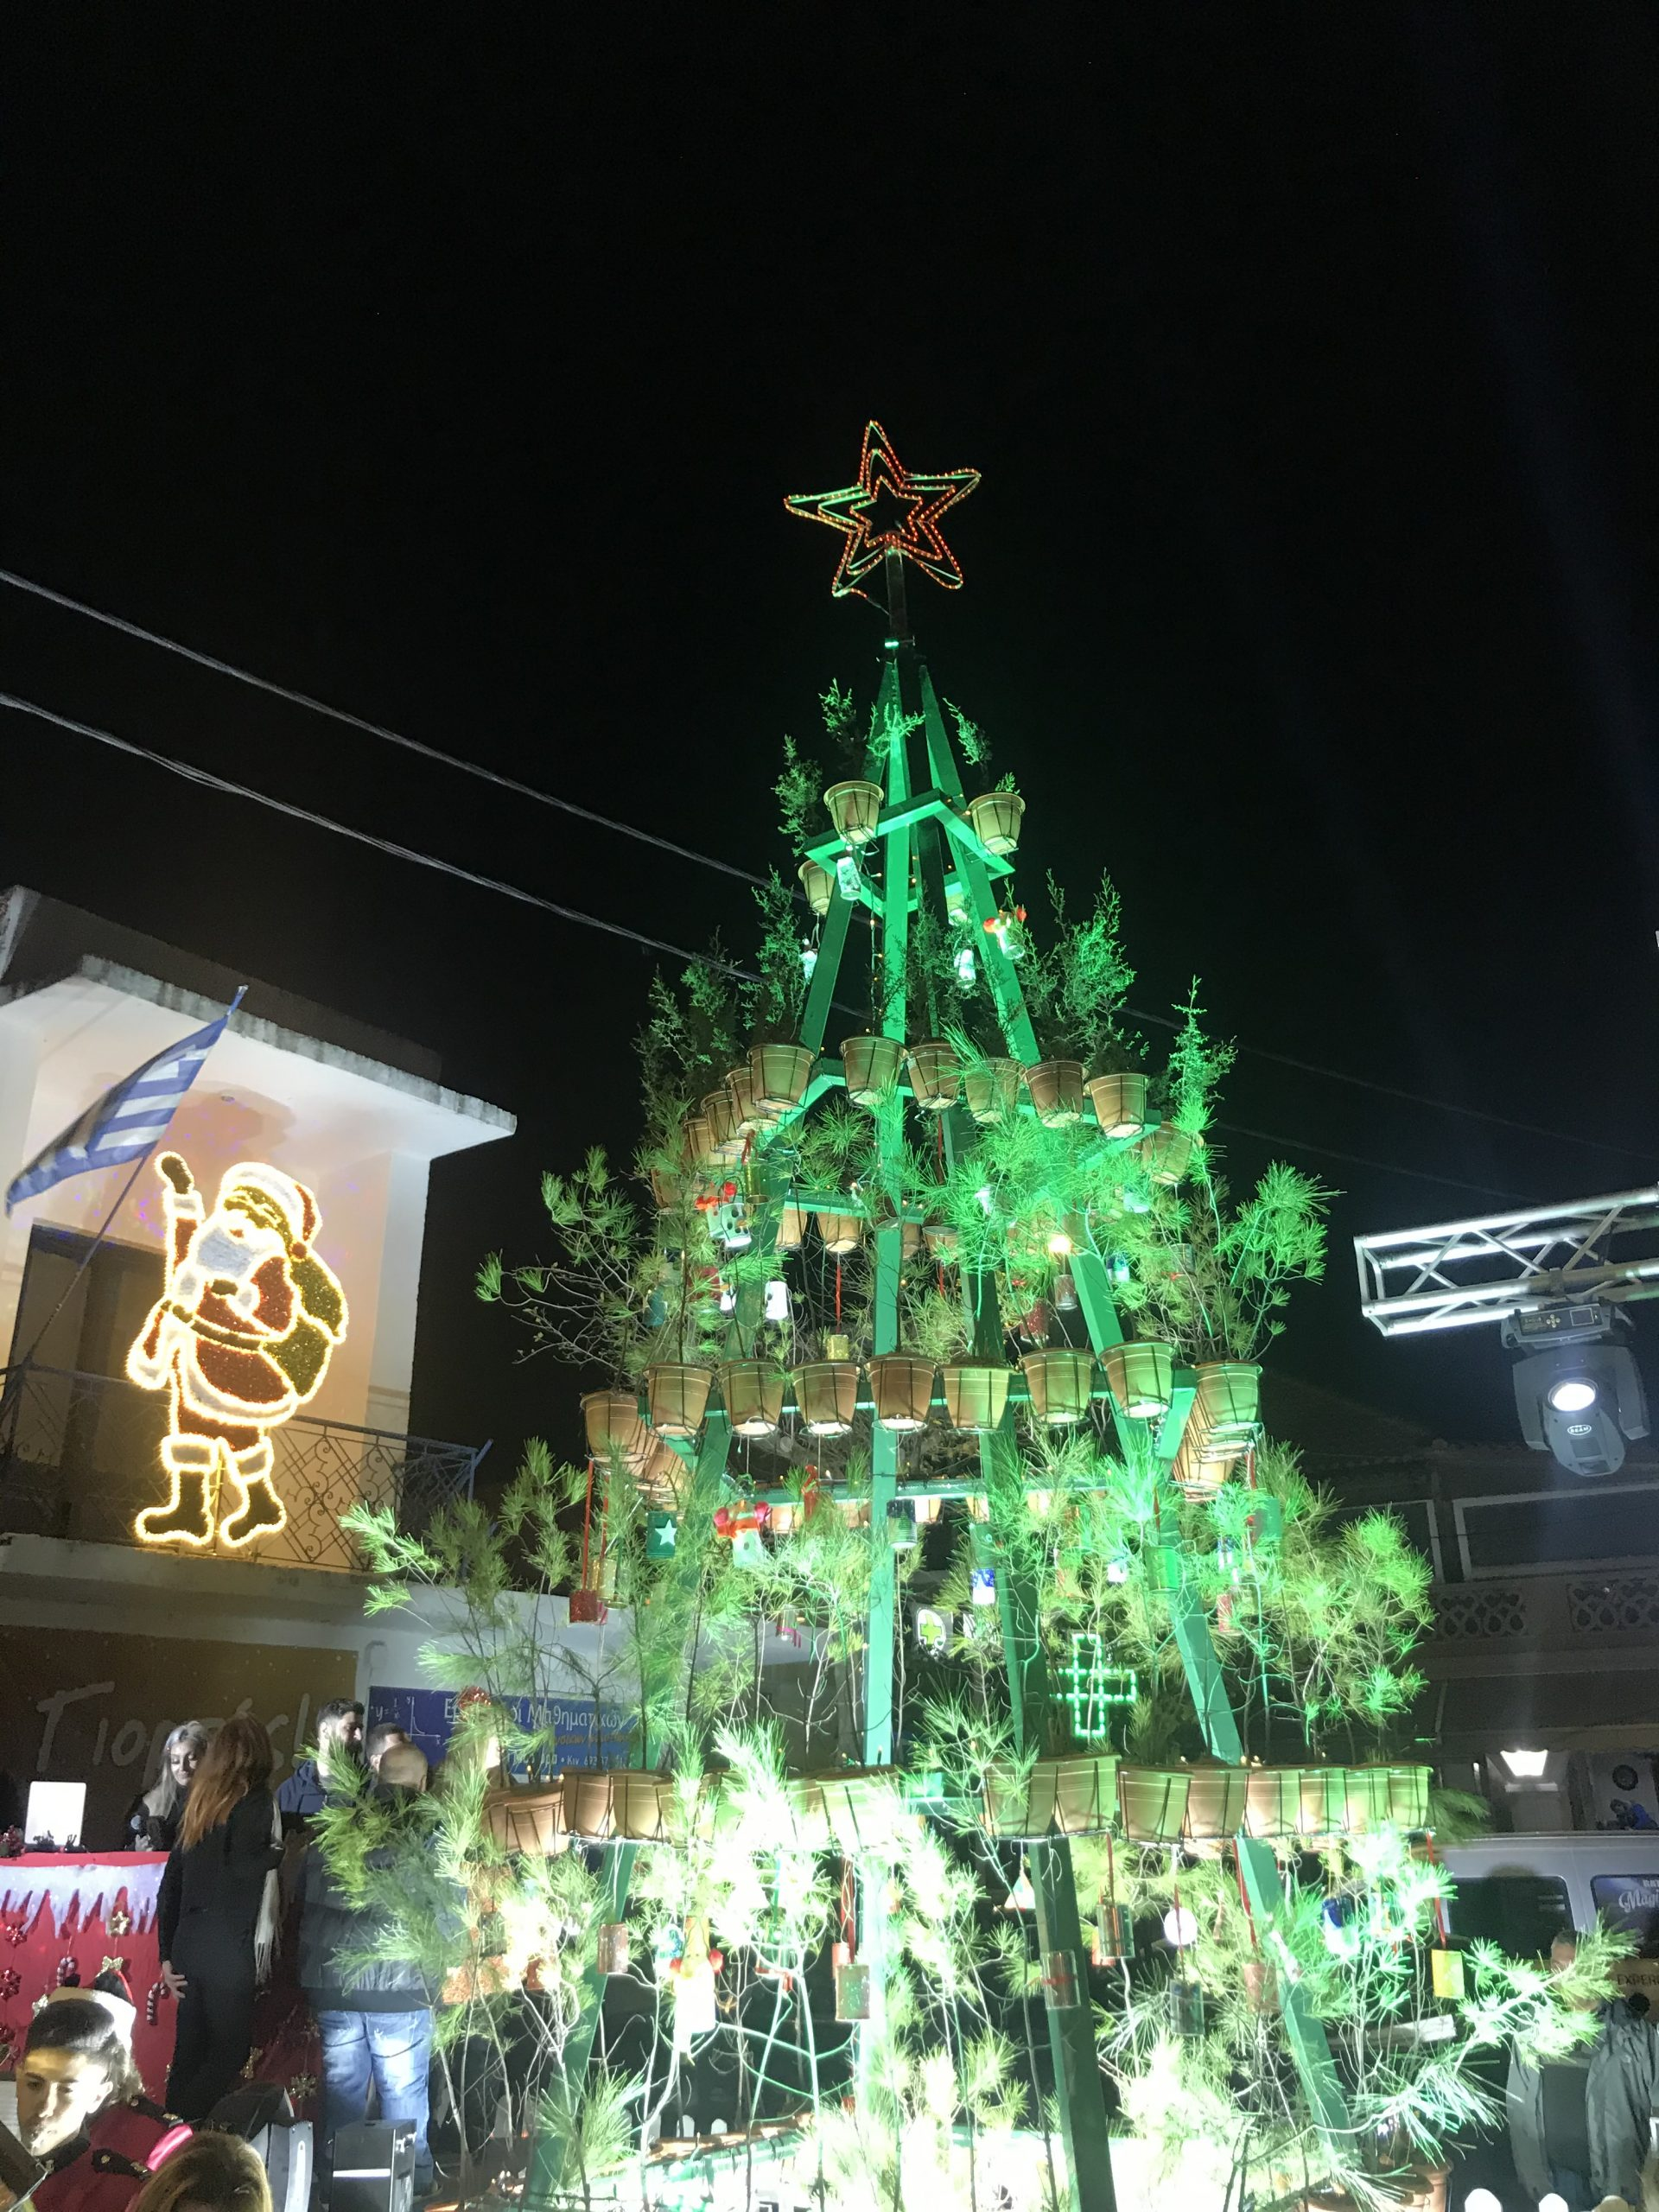 A Different Christmas Tree / Ένα διαφορετικό Χριστουγεννιάτικο Δέντρο